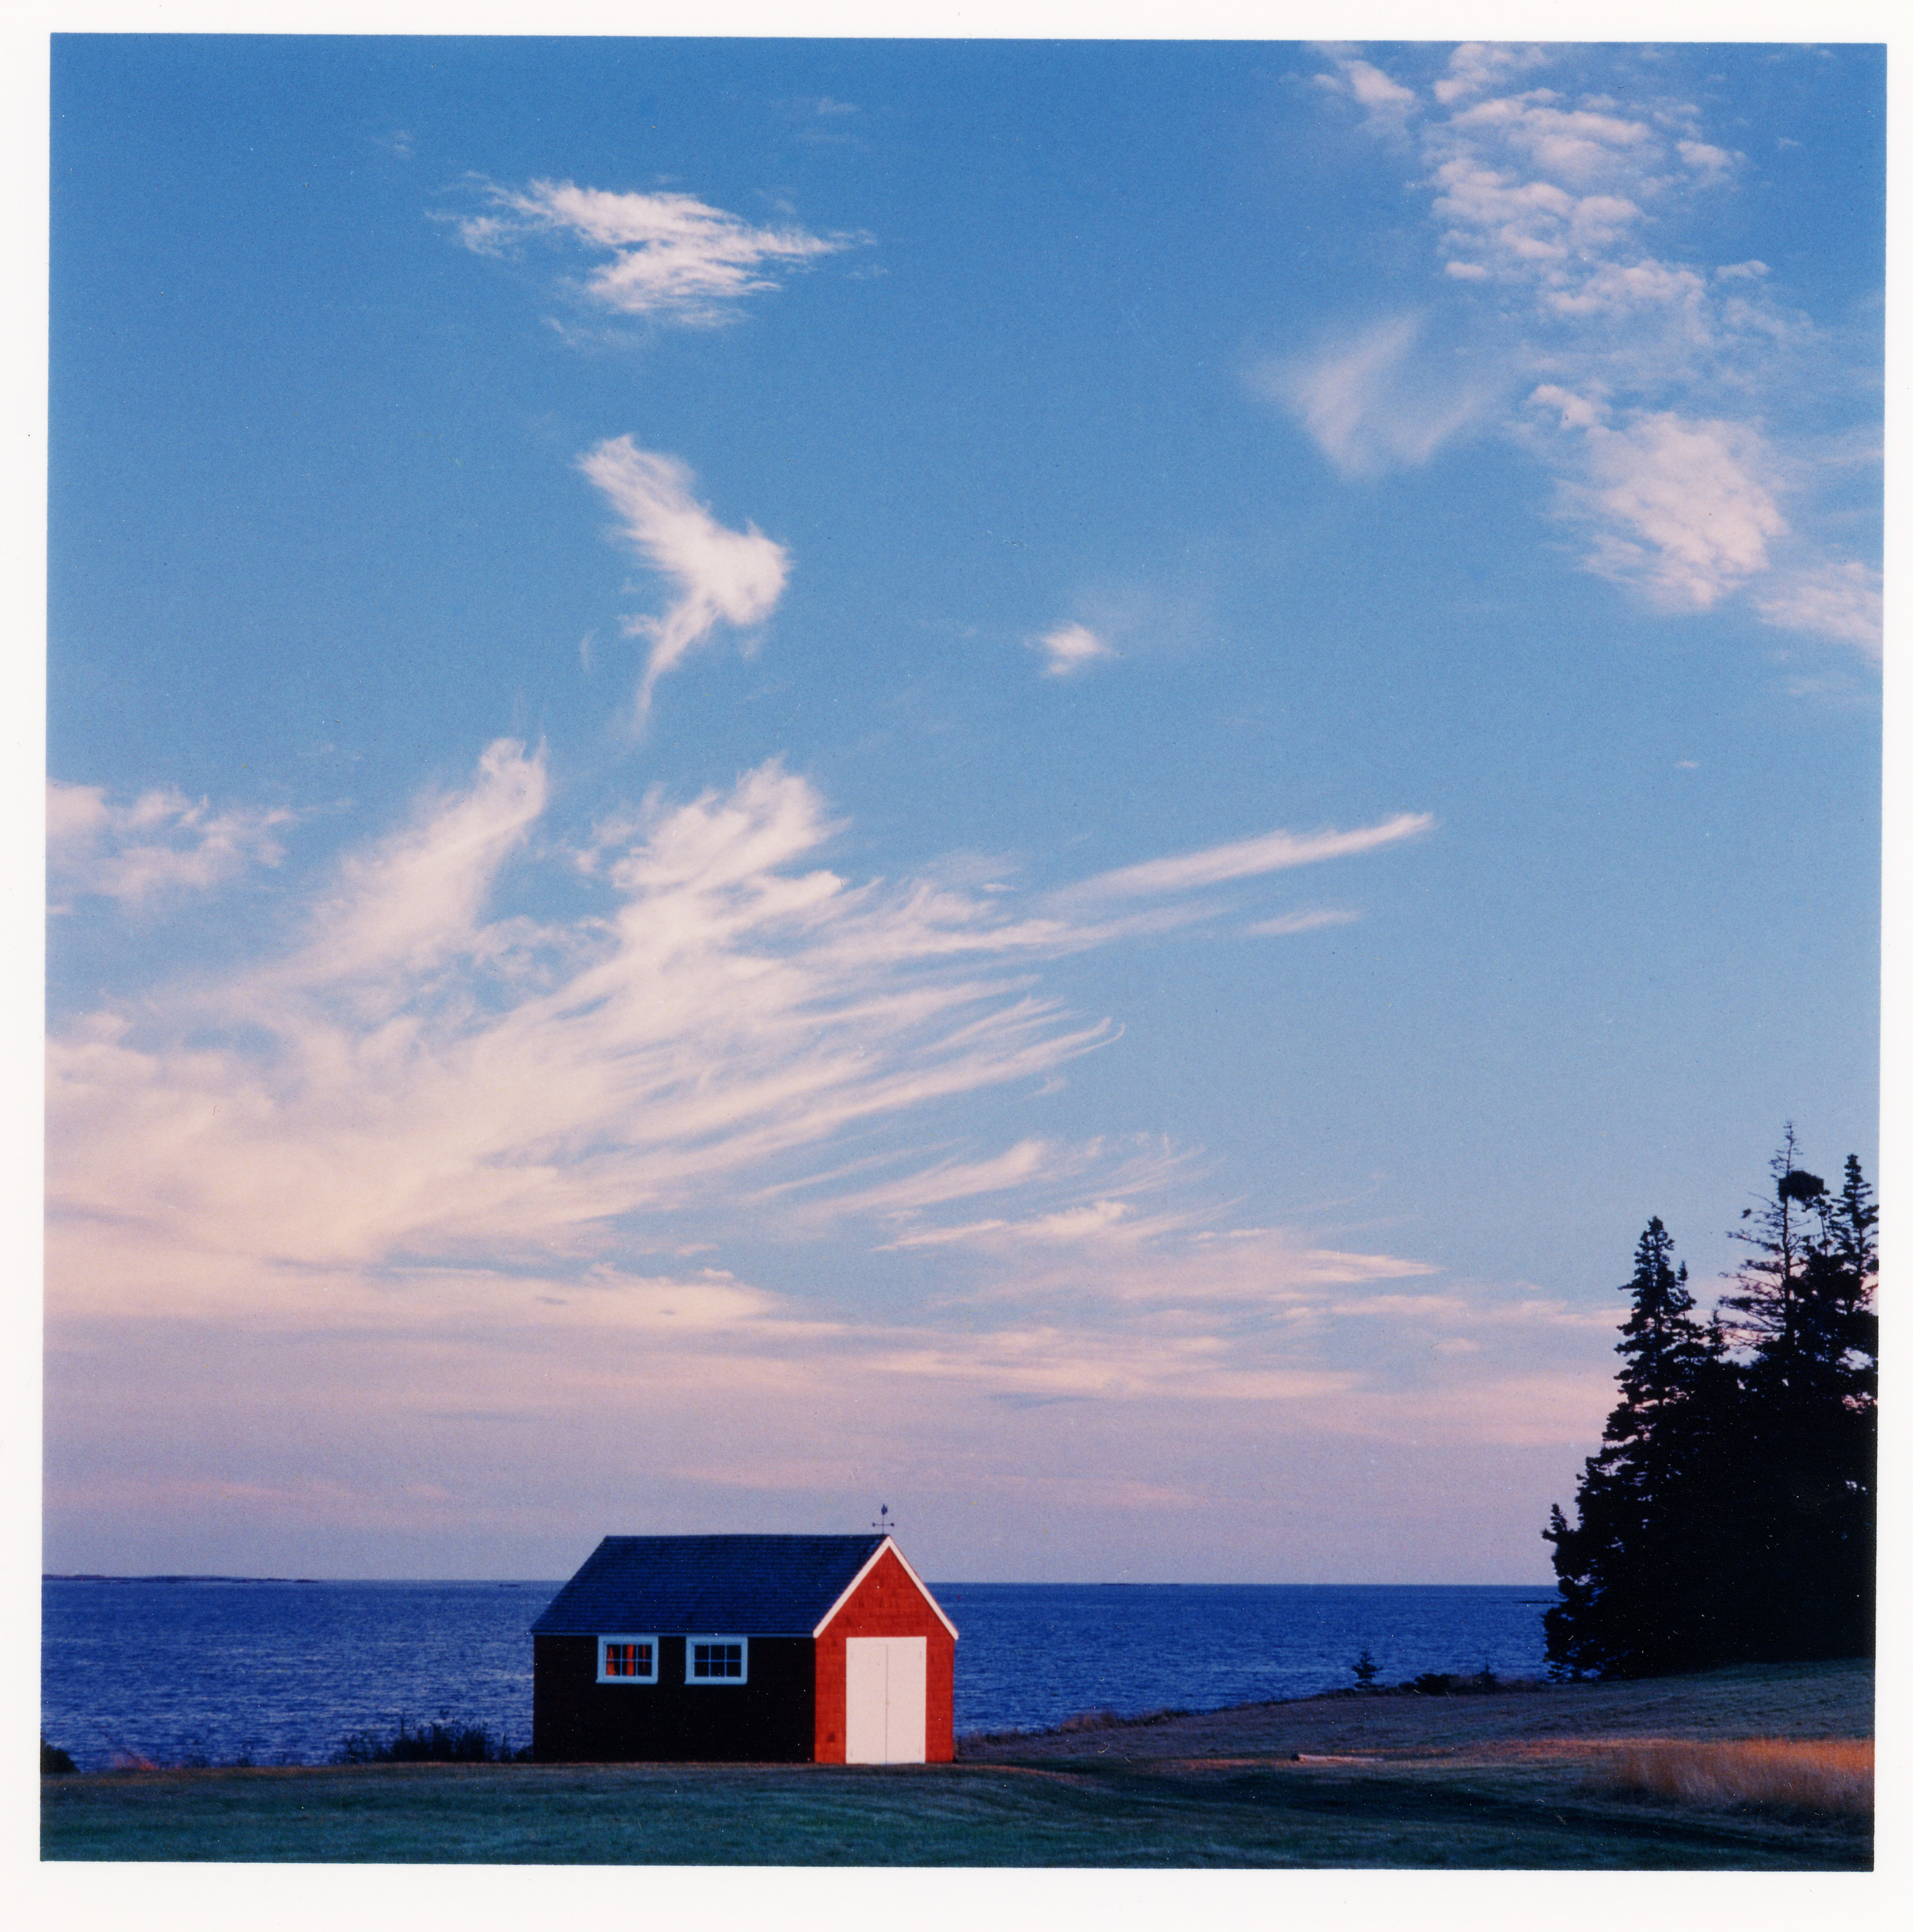 red house2.jpg